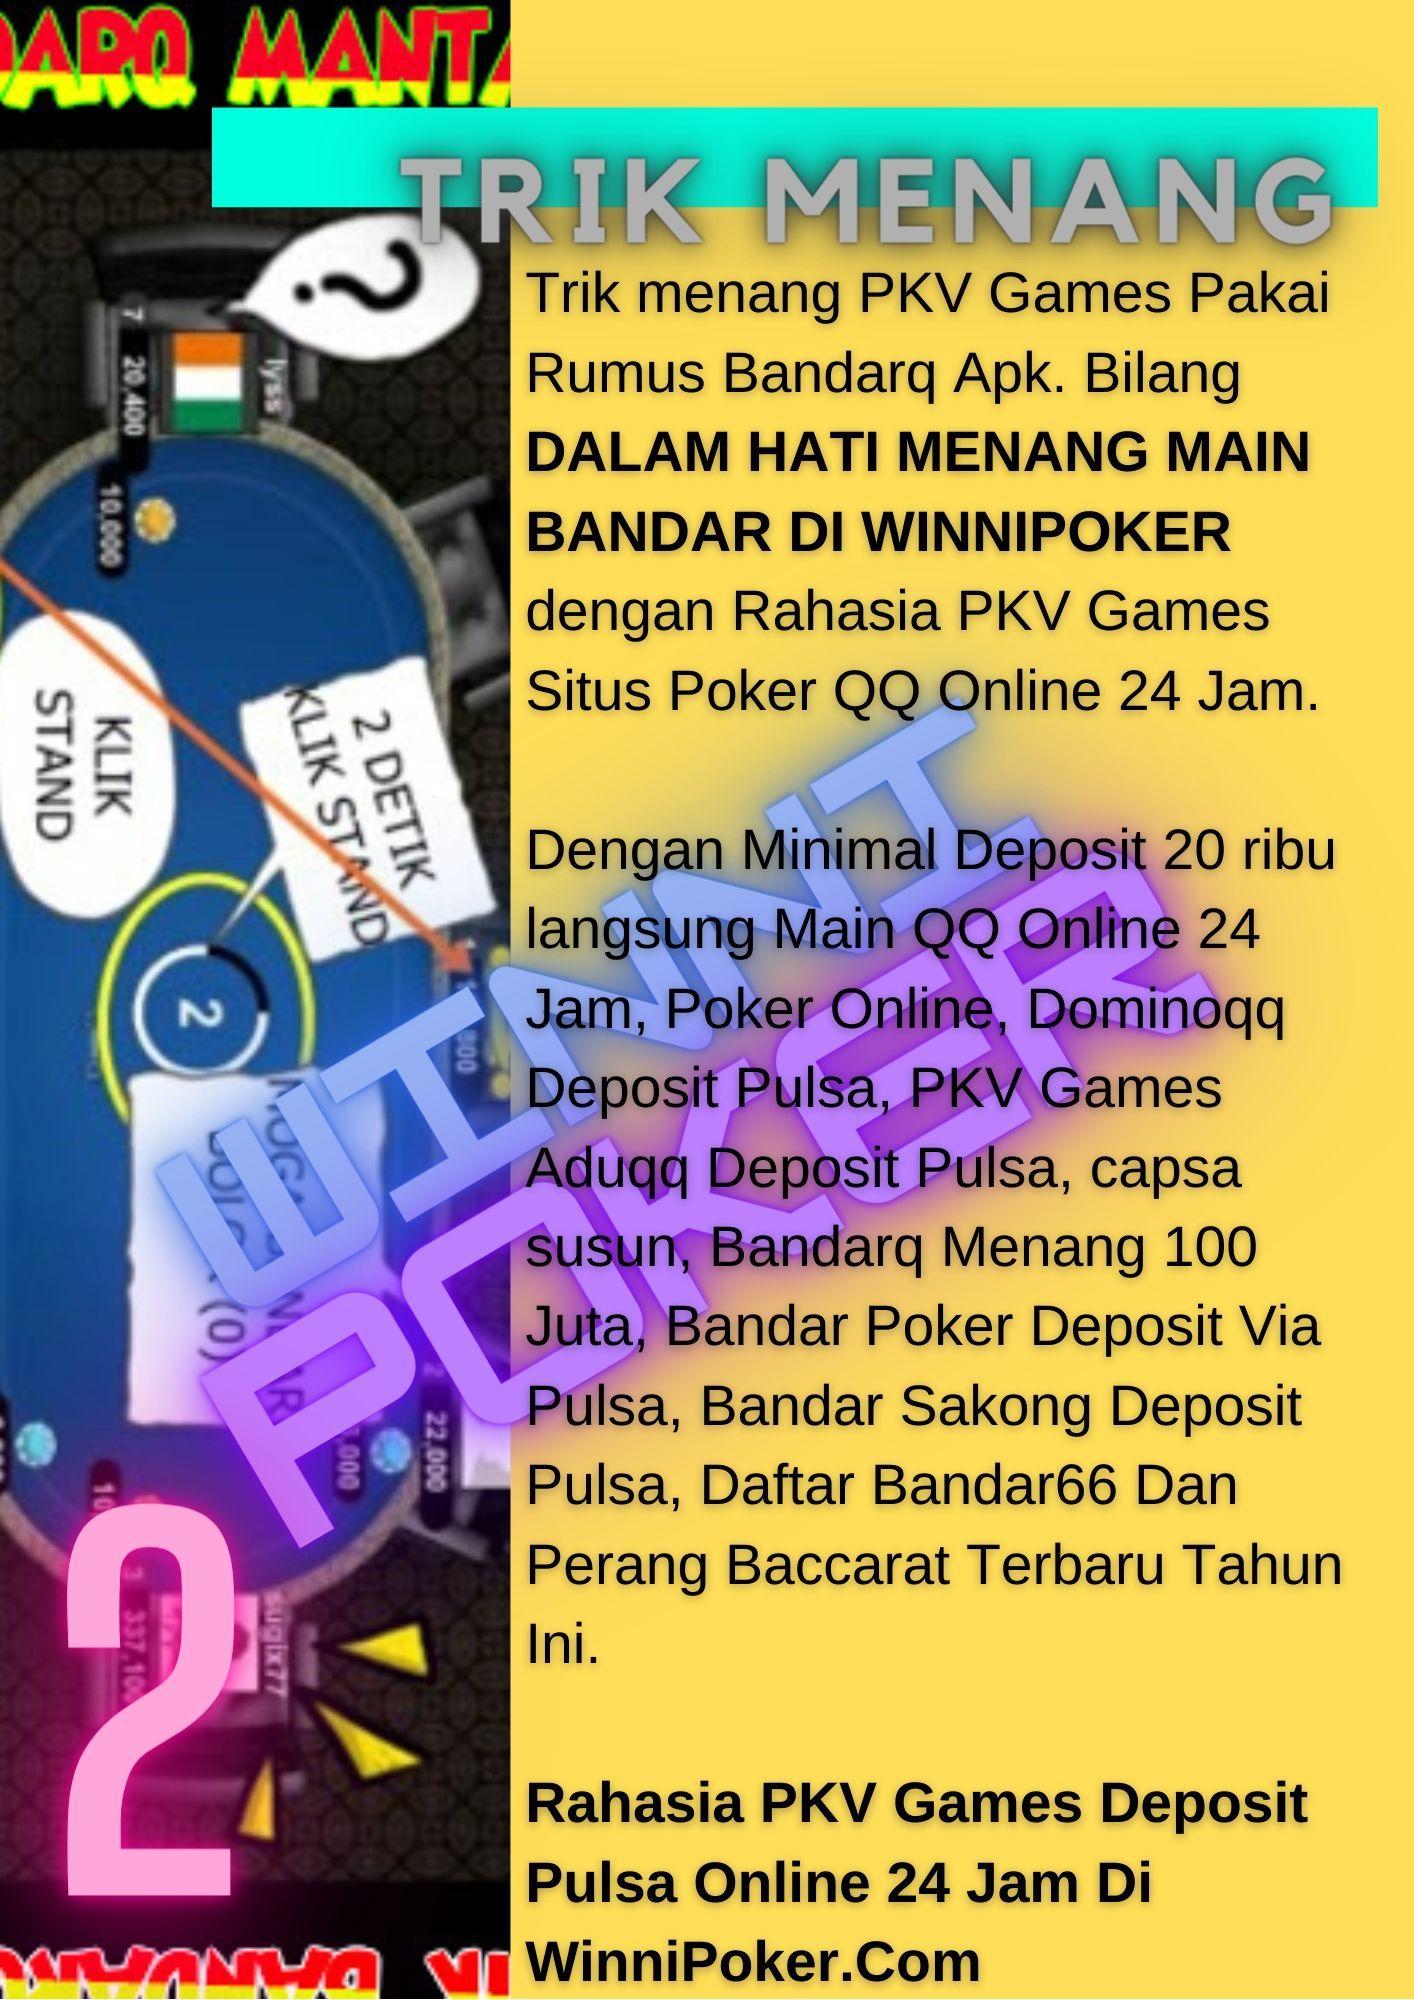 Trik Menang Pkv Games Pakai Rumus Bandarq Apk Online How To Make Make It Yourself